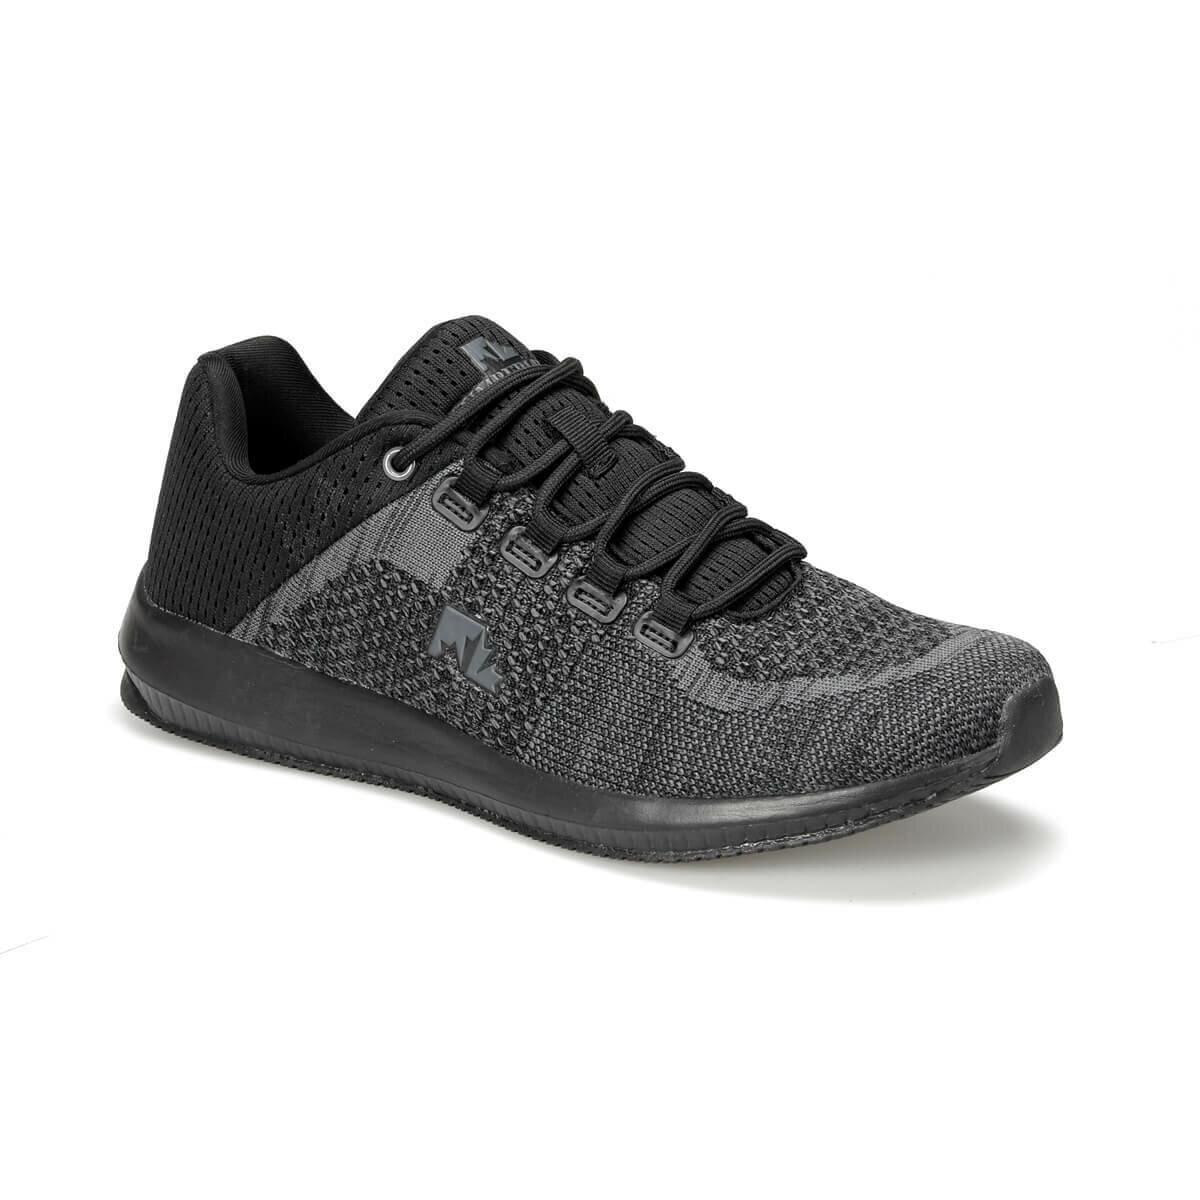 FLO Men Sneakers Mesh Casual Shoes Lace-up Men Shoes Lightweight Comfortable Breathable Walking Sneakers Shoes Мужские кроссовки ALE 9PR LUMBERJACK